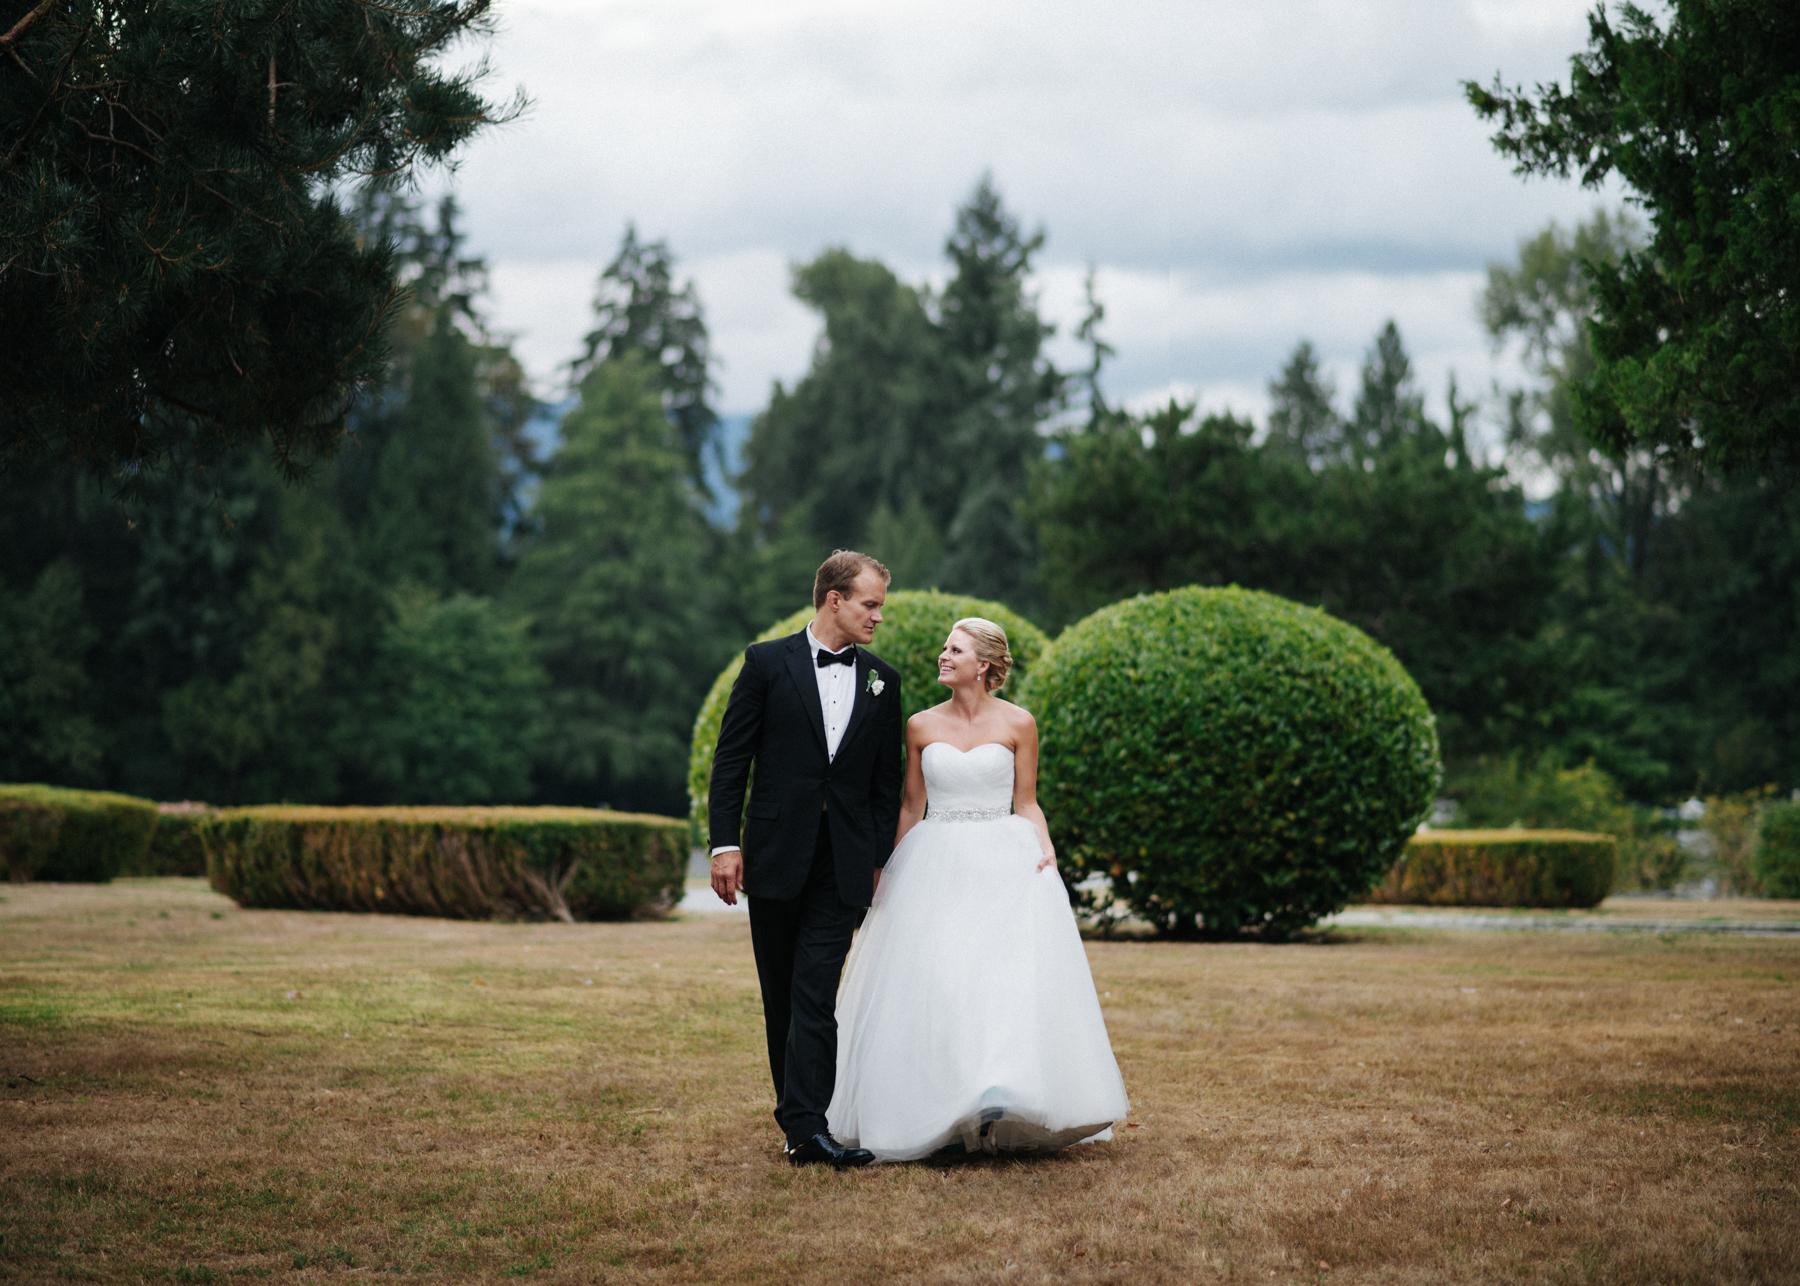 kaoverii_silva_photographer_via-herafilms_kelly_mike_wedding-28.jpg